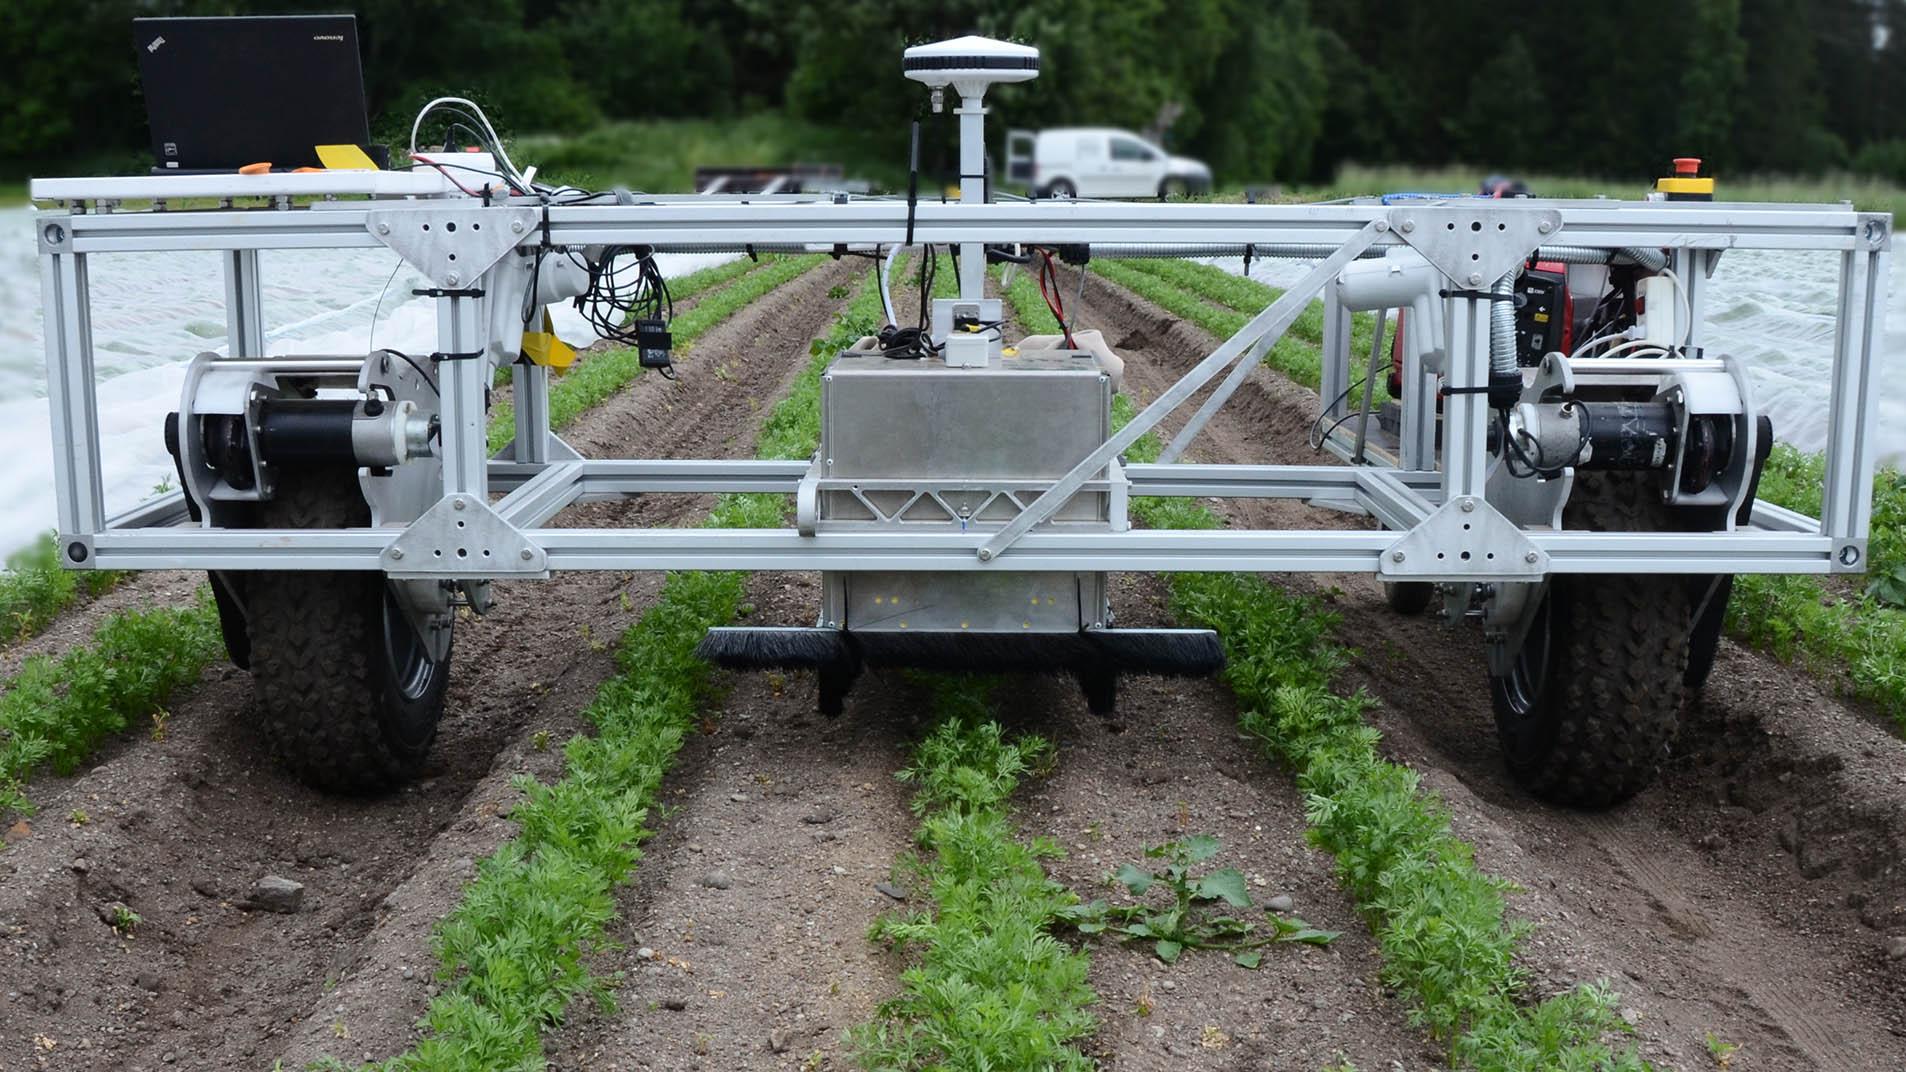 Prototype in the field